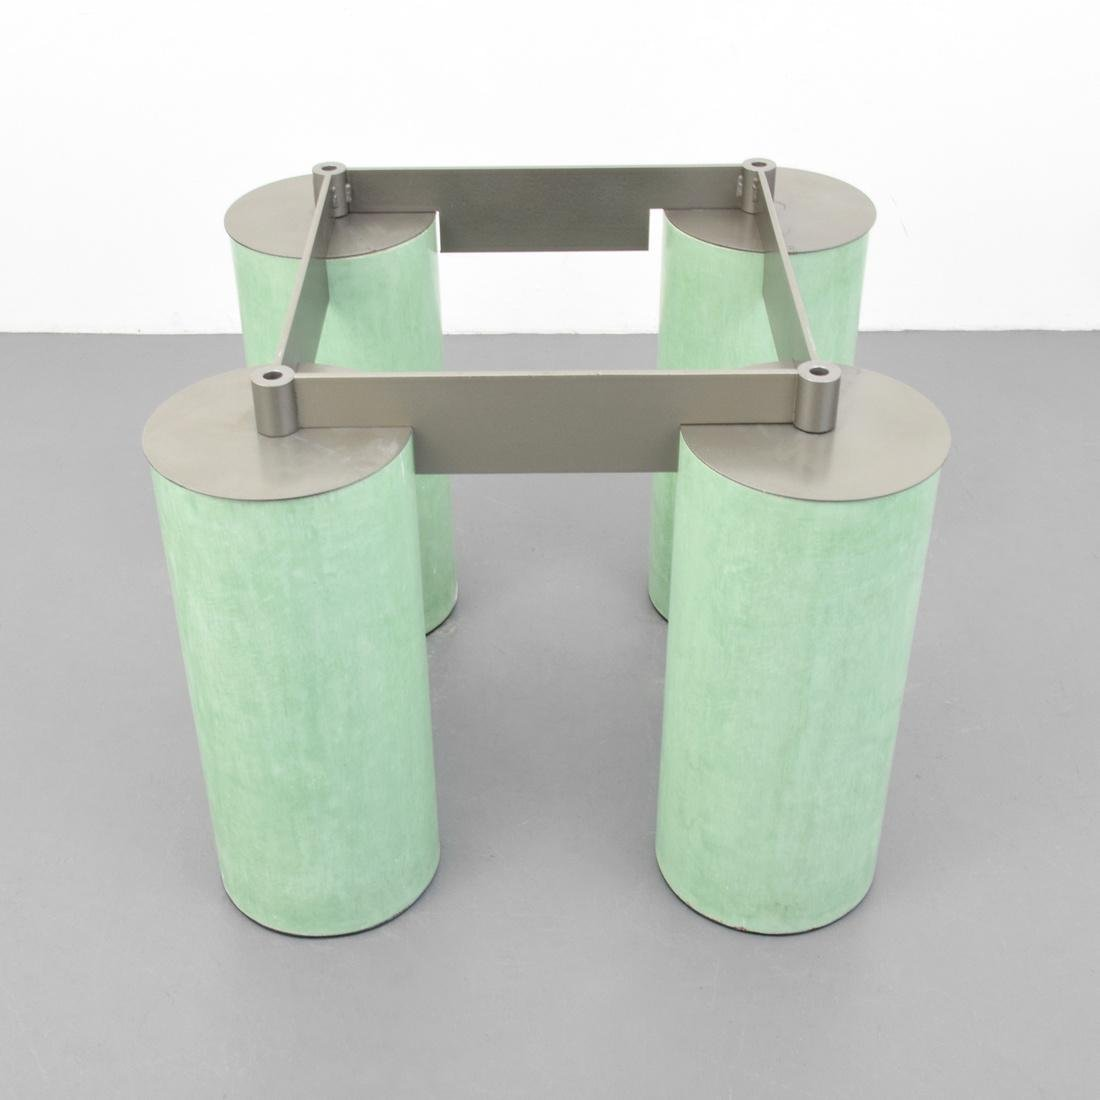 Large Massimo Vignelli SERENISSIMO Dining Table - 3